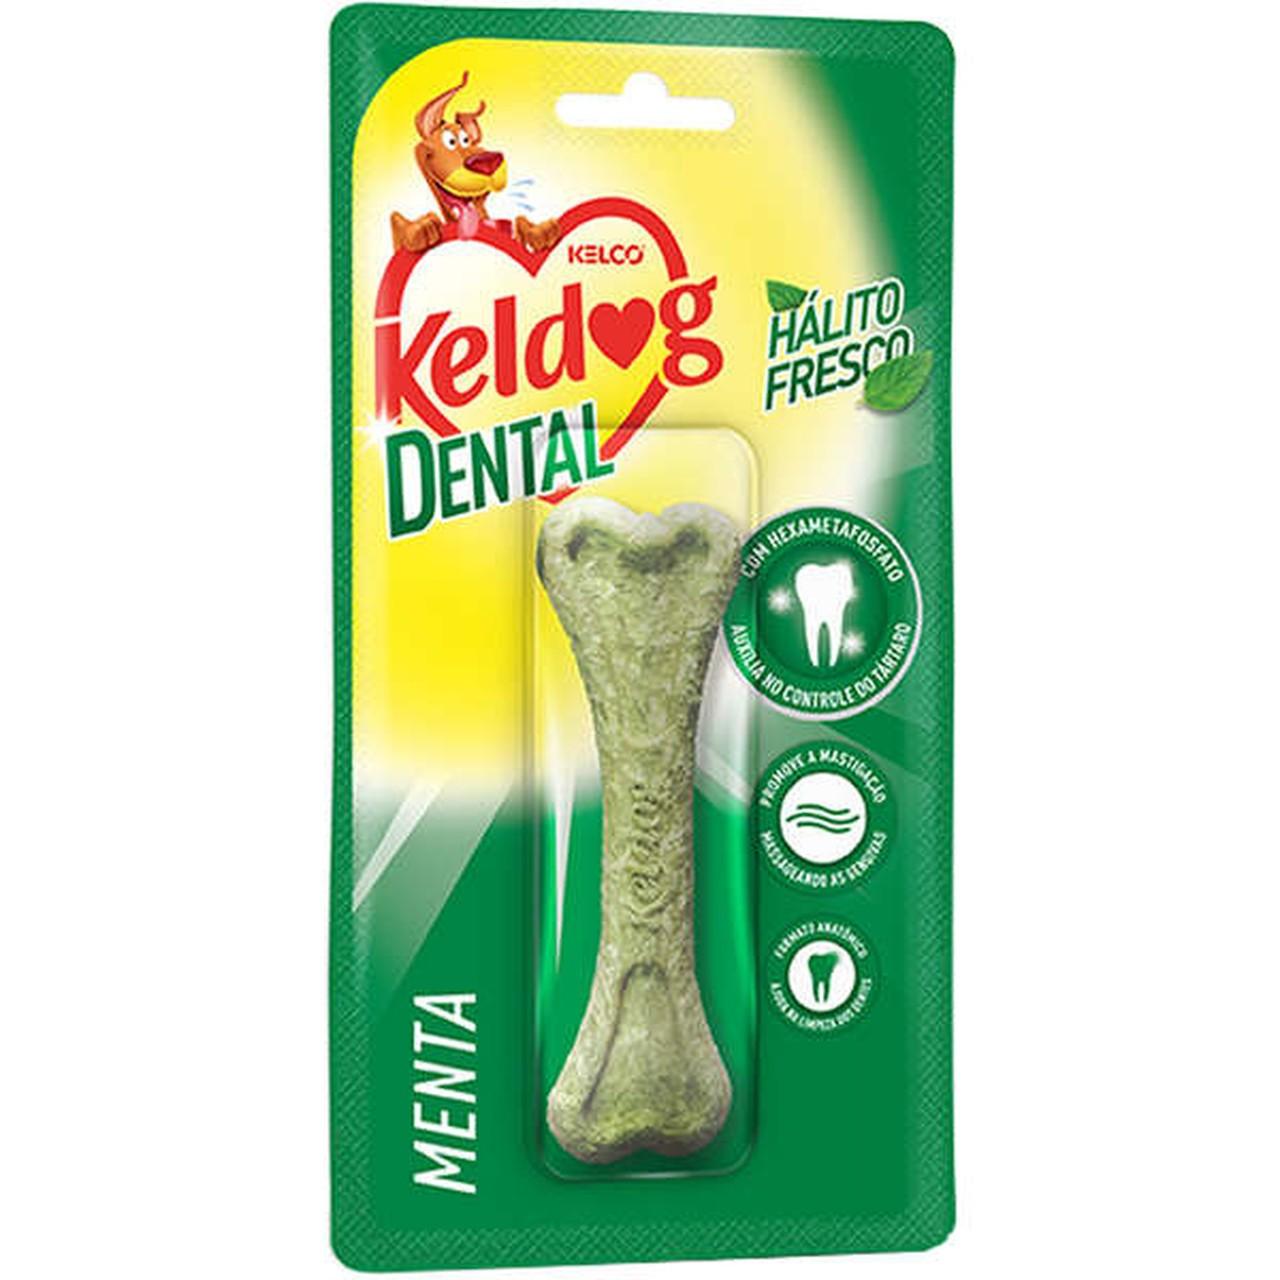 Dental Menta Keldog Halito Fresco